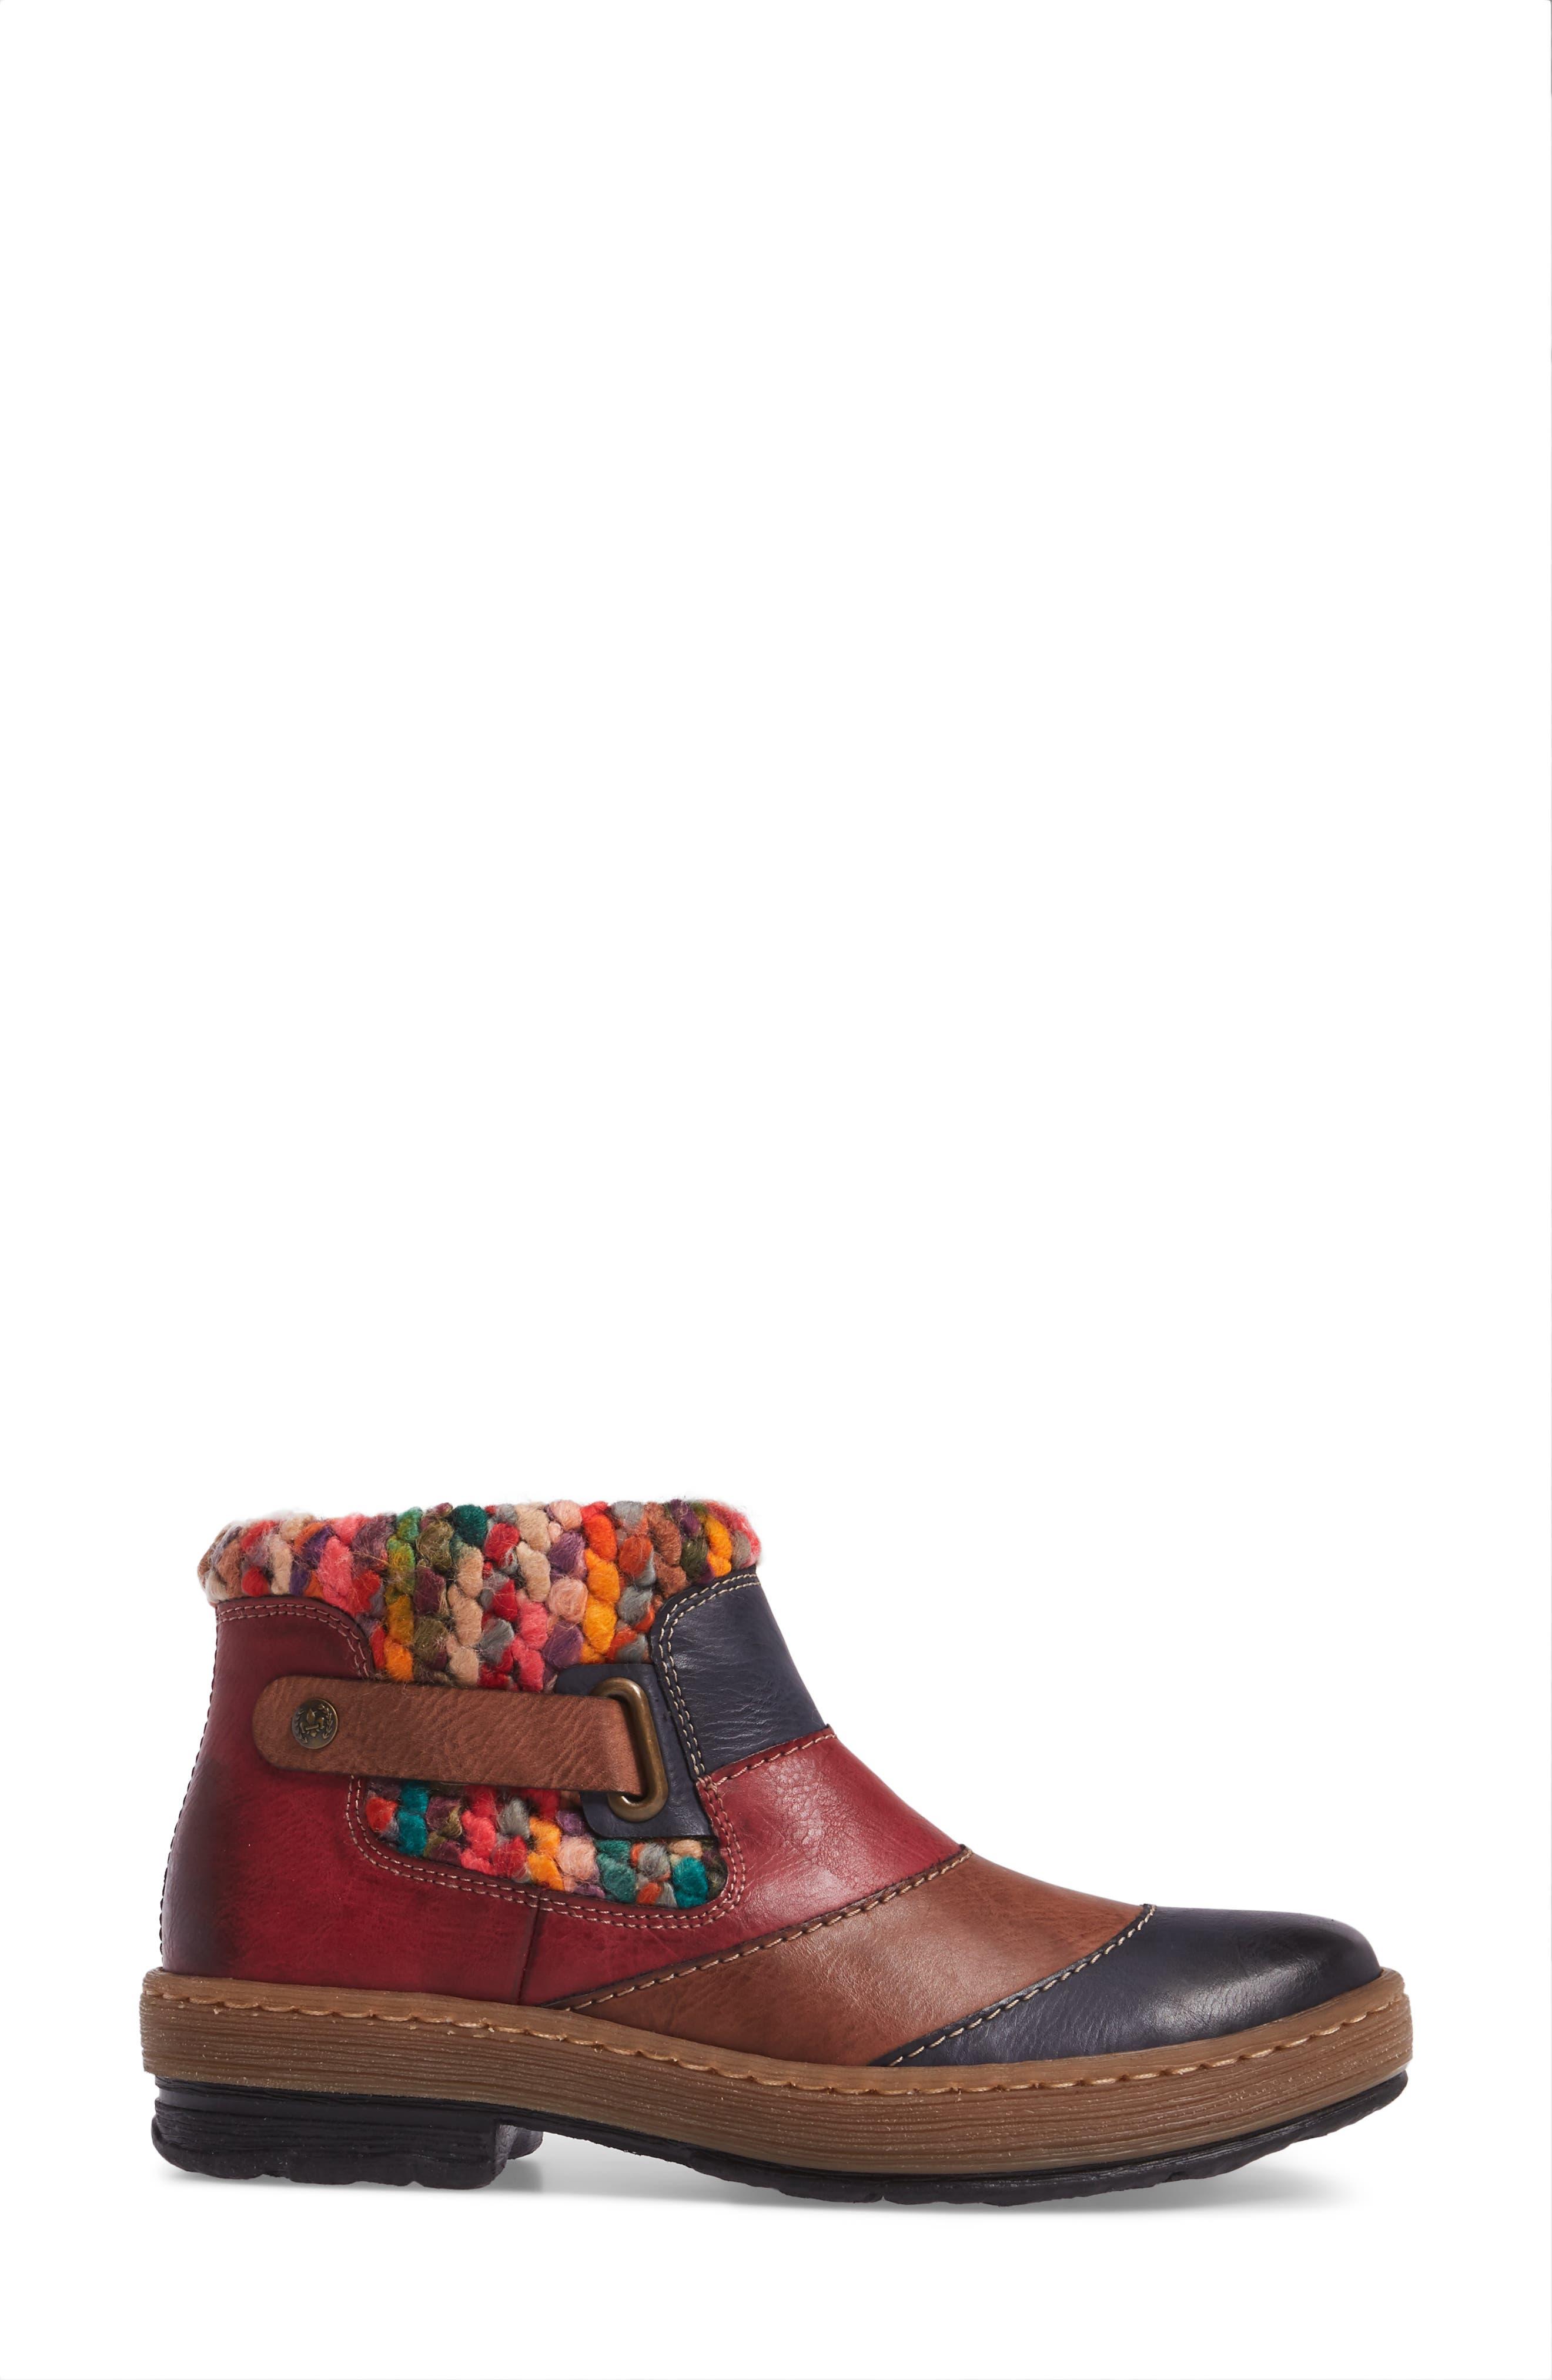 Felicitas 82 Boot,                             Alternate thumbnail 3, color,                             930